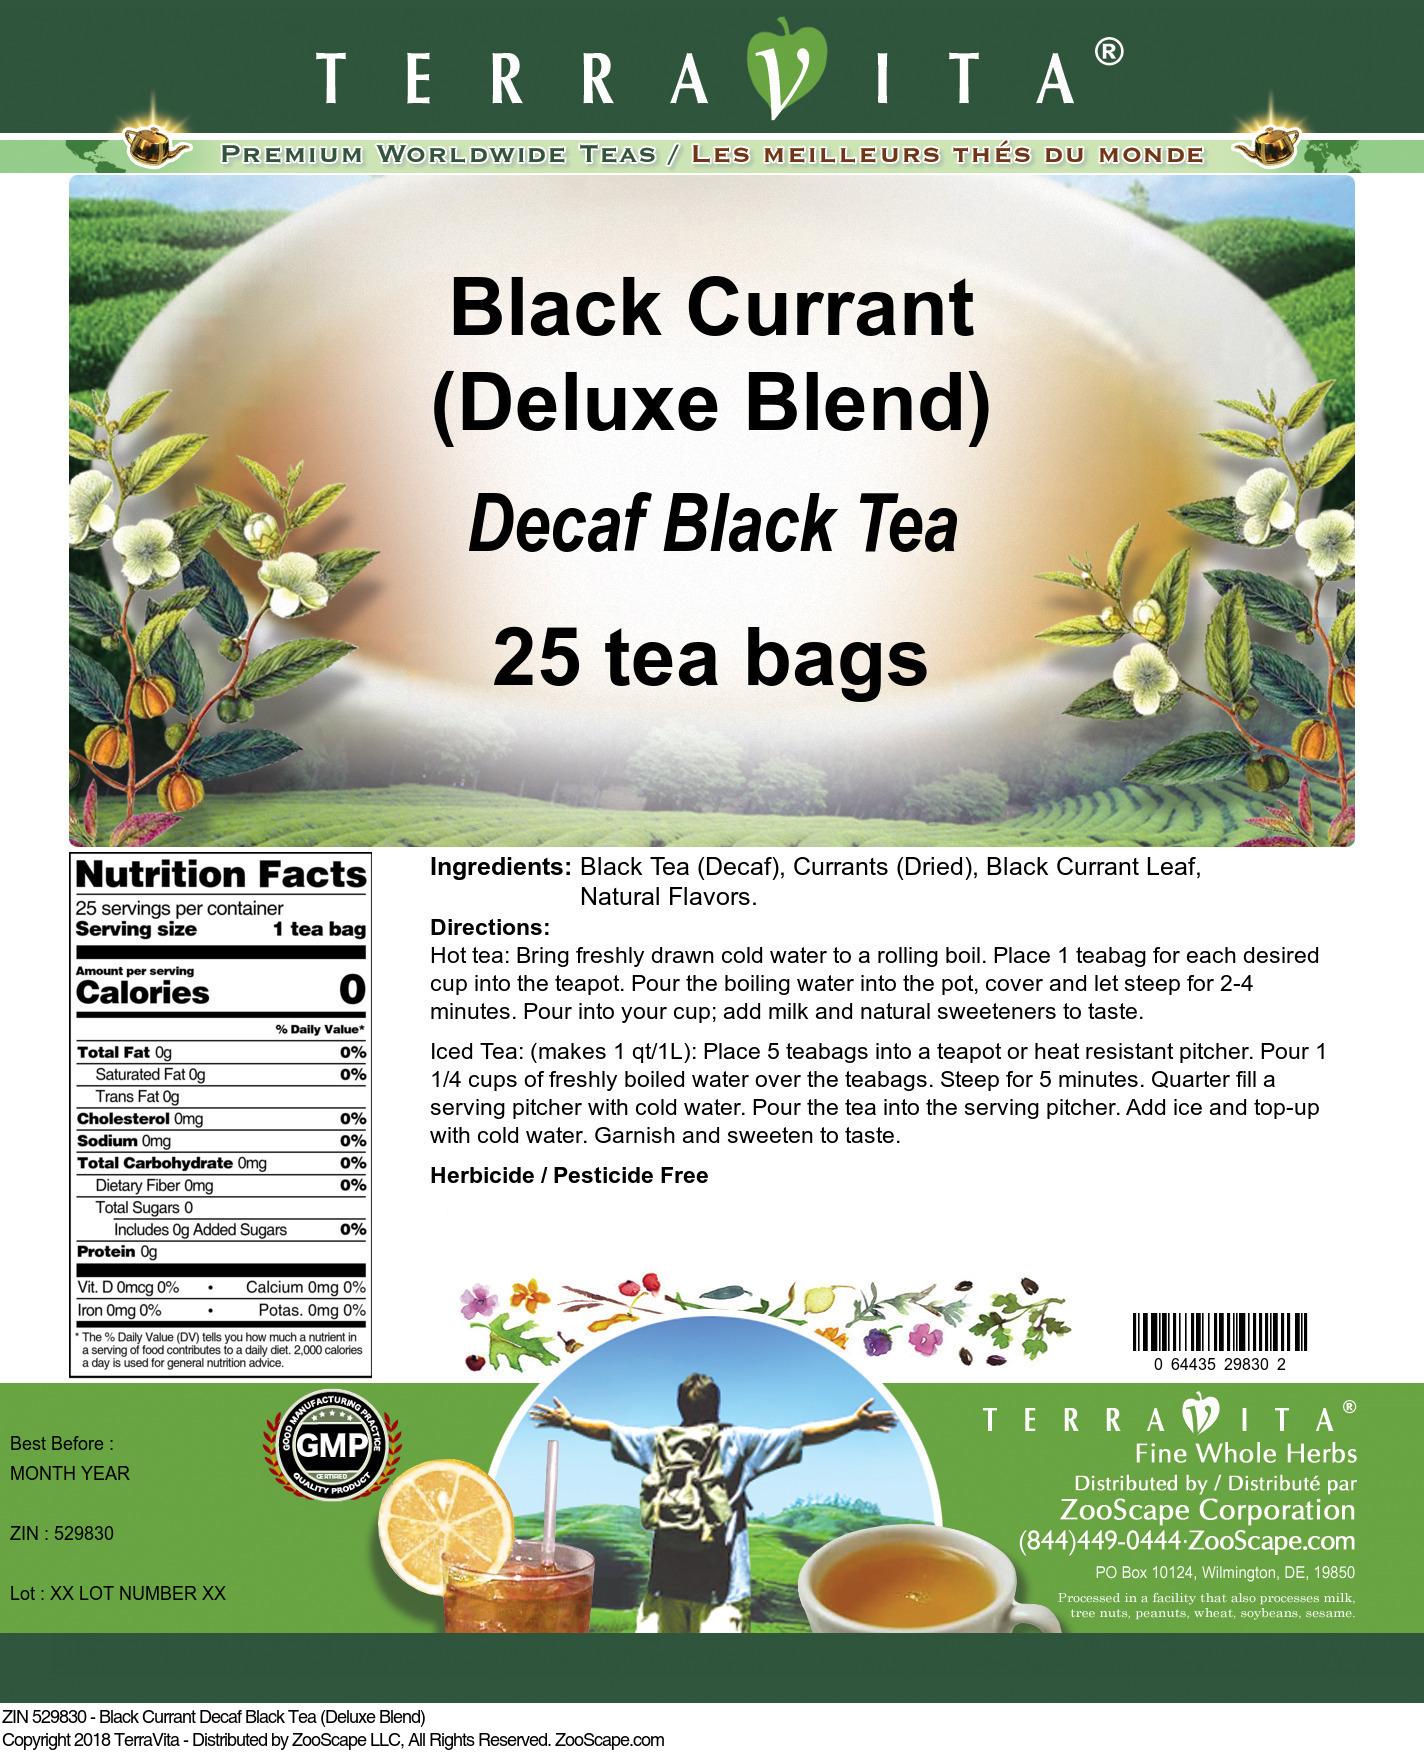 Black Currant Decaf Black Tea (Deluxe Blend)